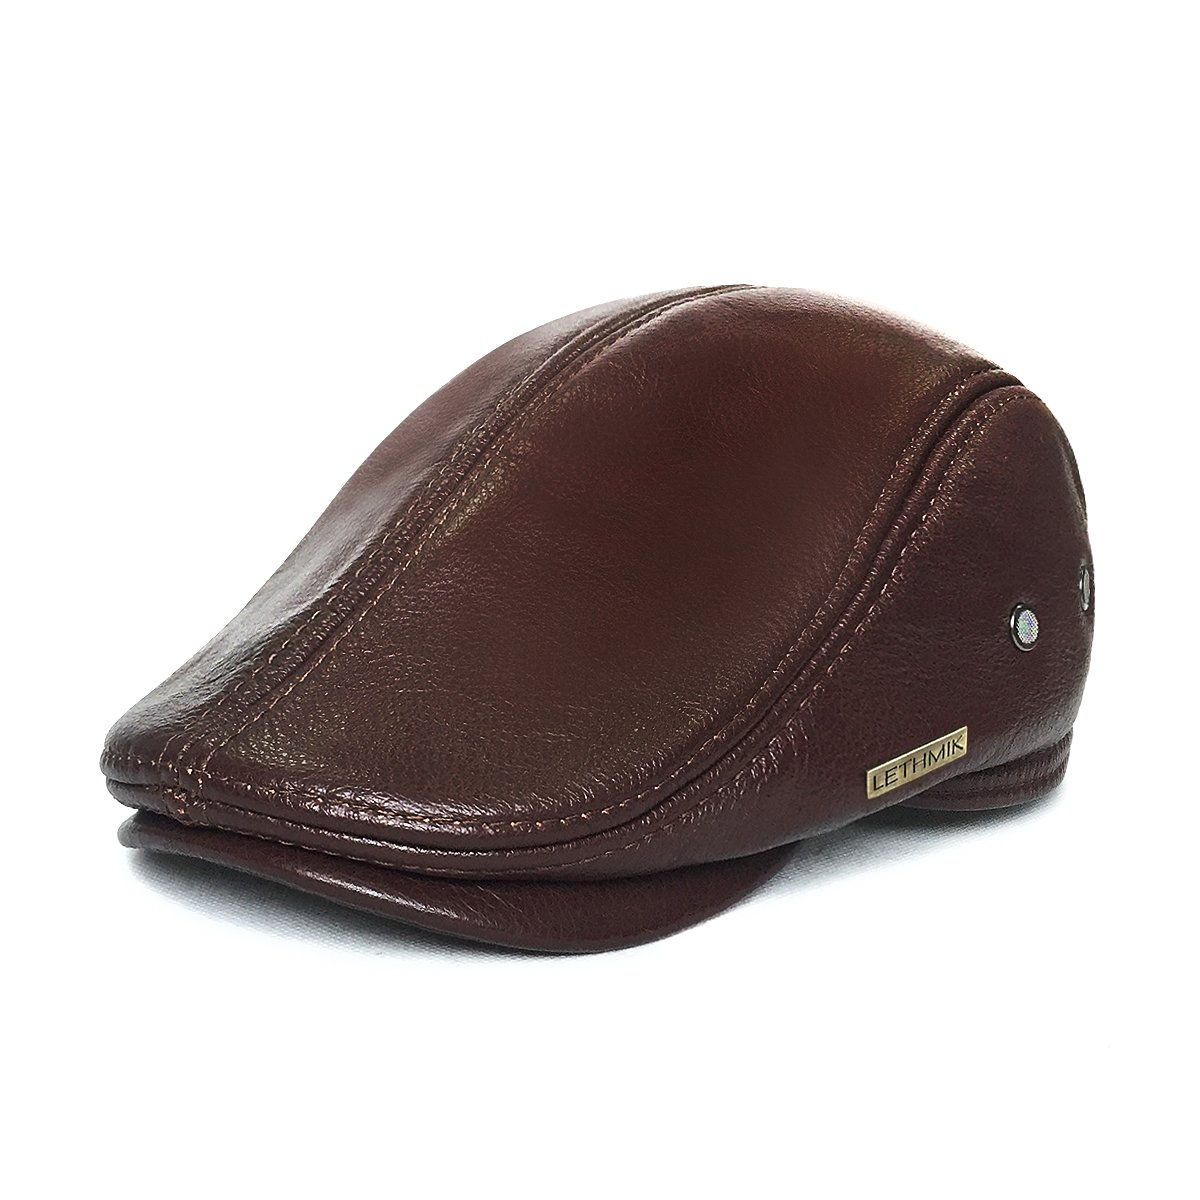 073f728b5e0d7 LETHMIK Flat Cap Cabby Hat Genuine Leather Vintage Newsboy Cap Ivy Driving  Cap MZ0171